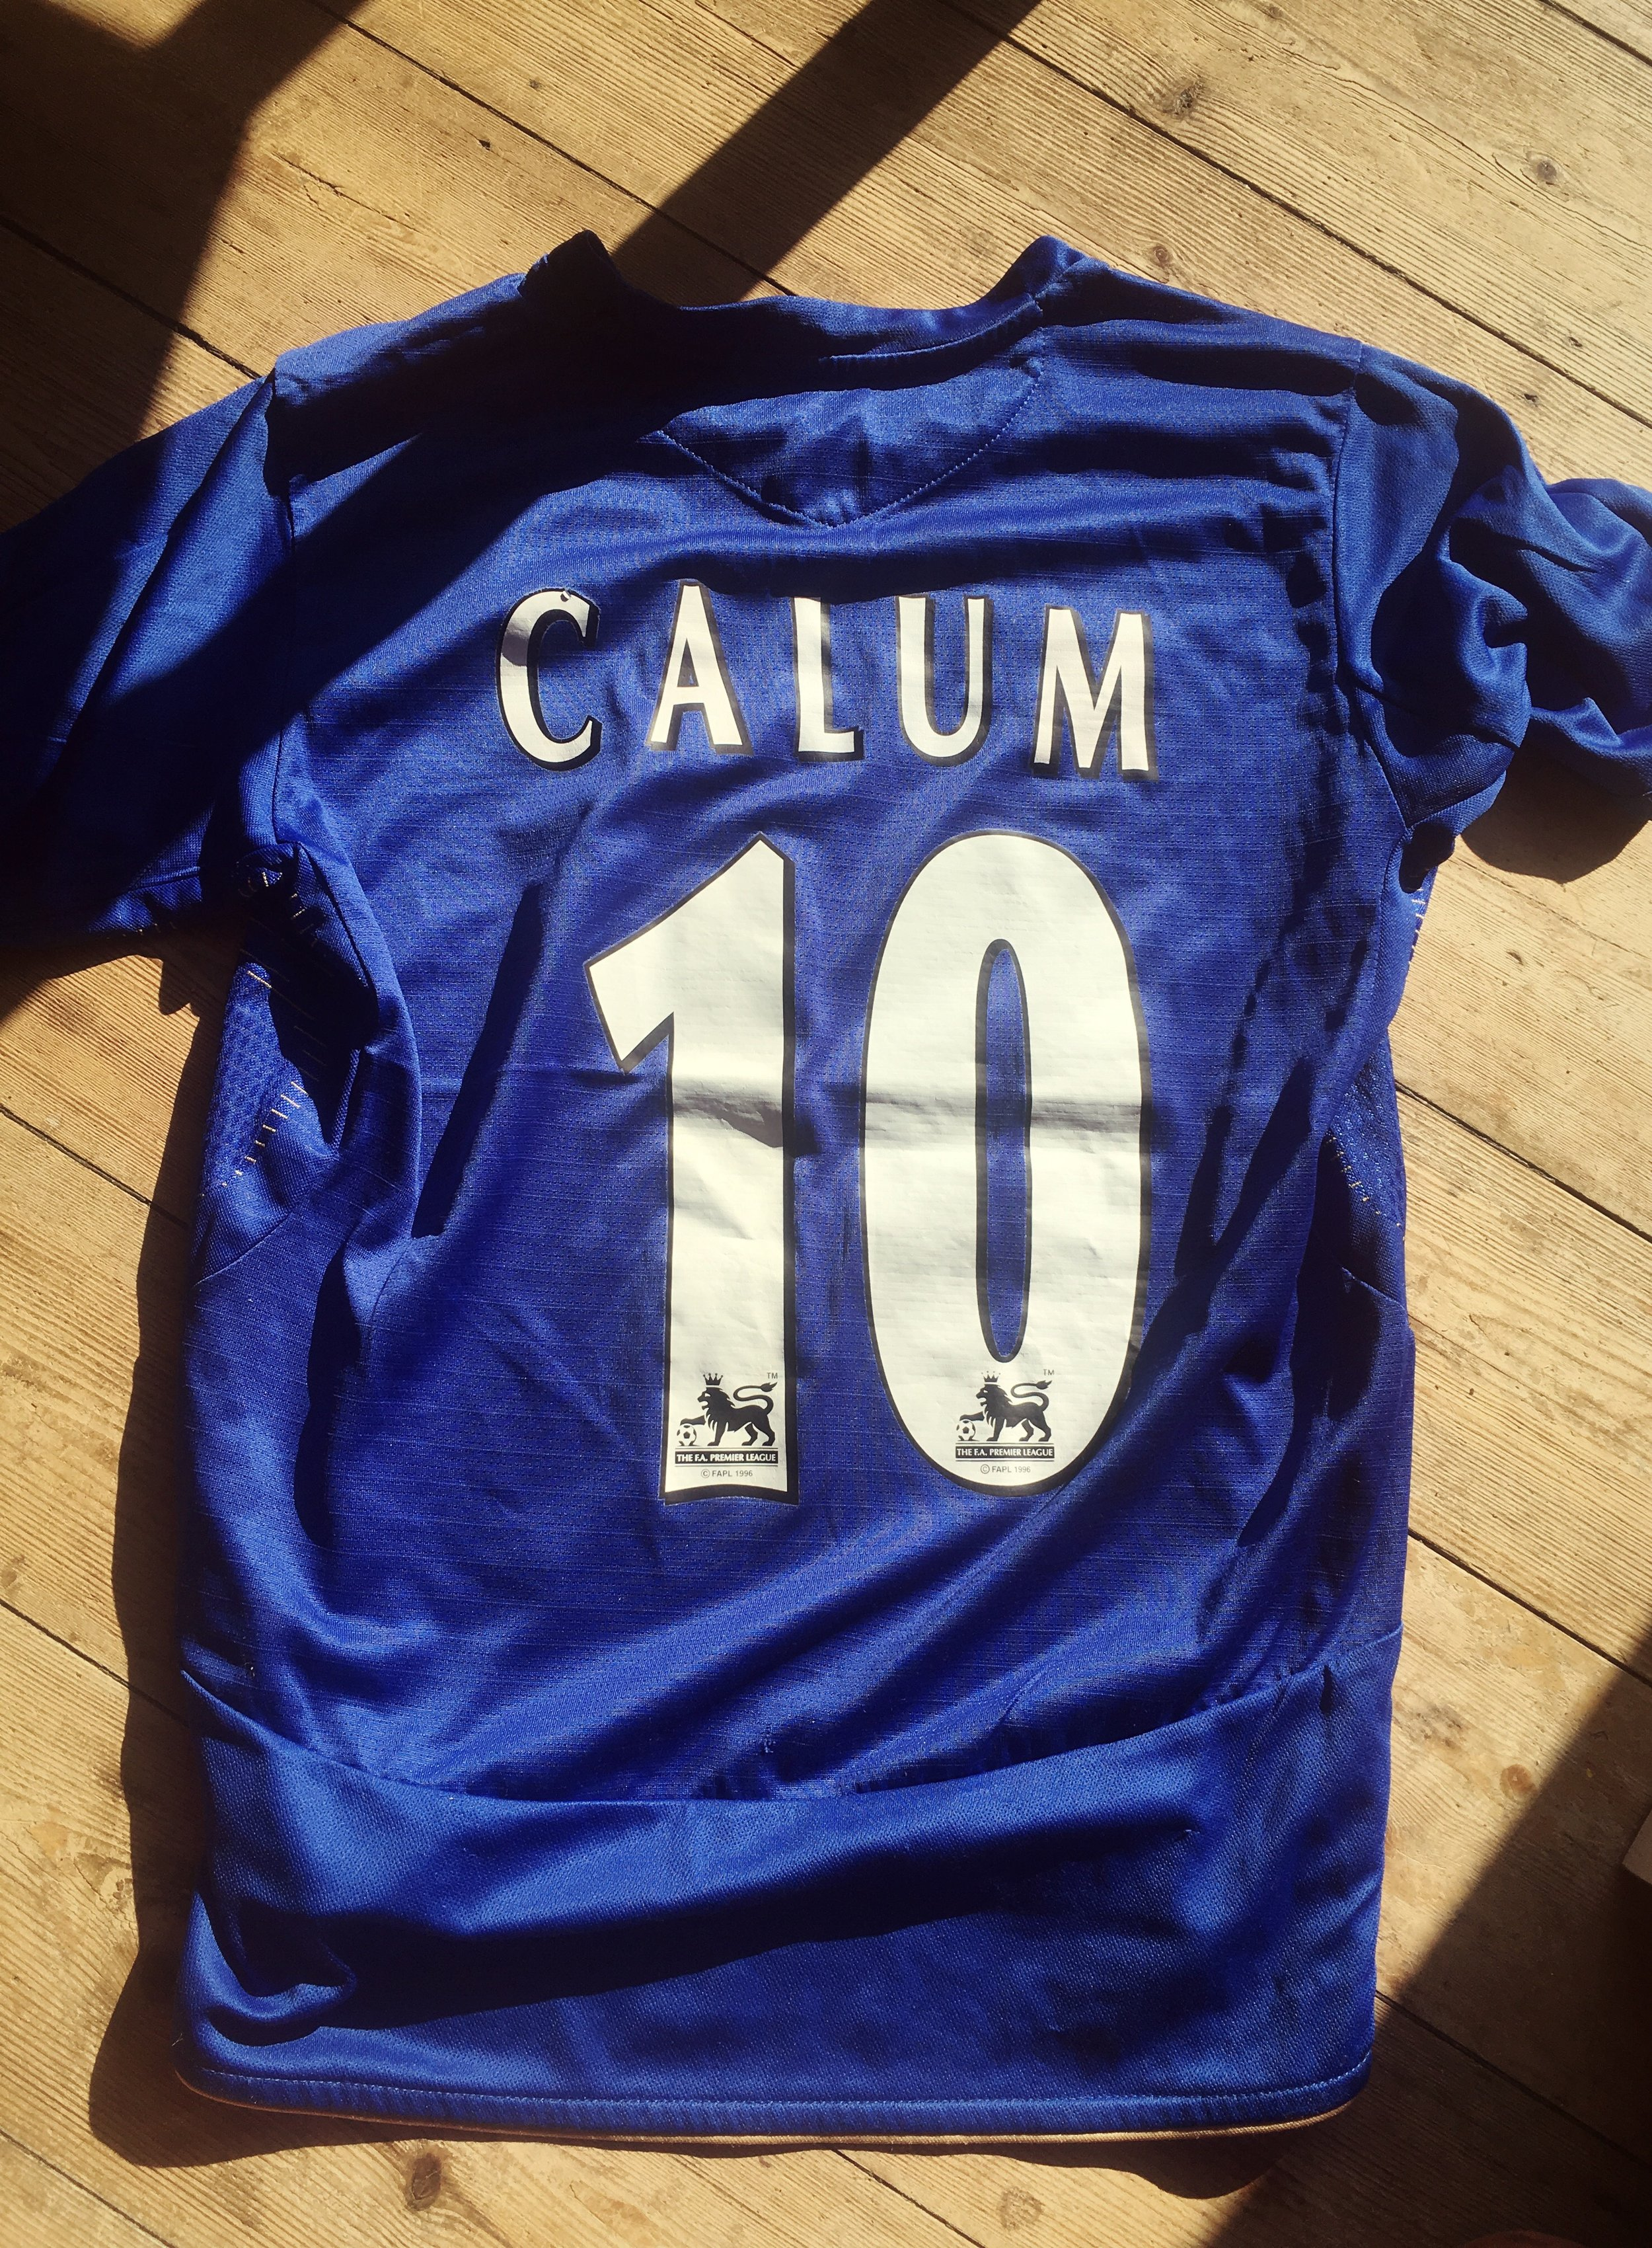 10th Birthday present from my Mum & Dad